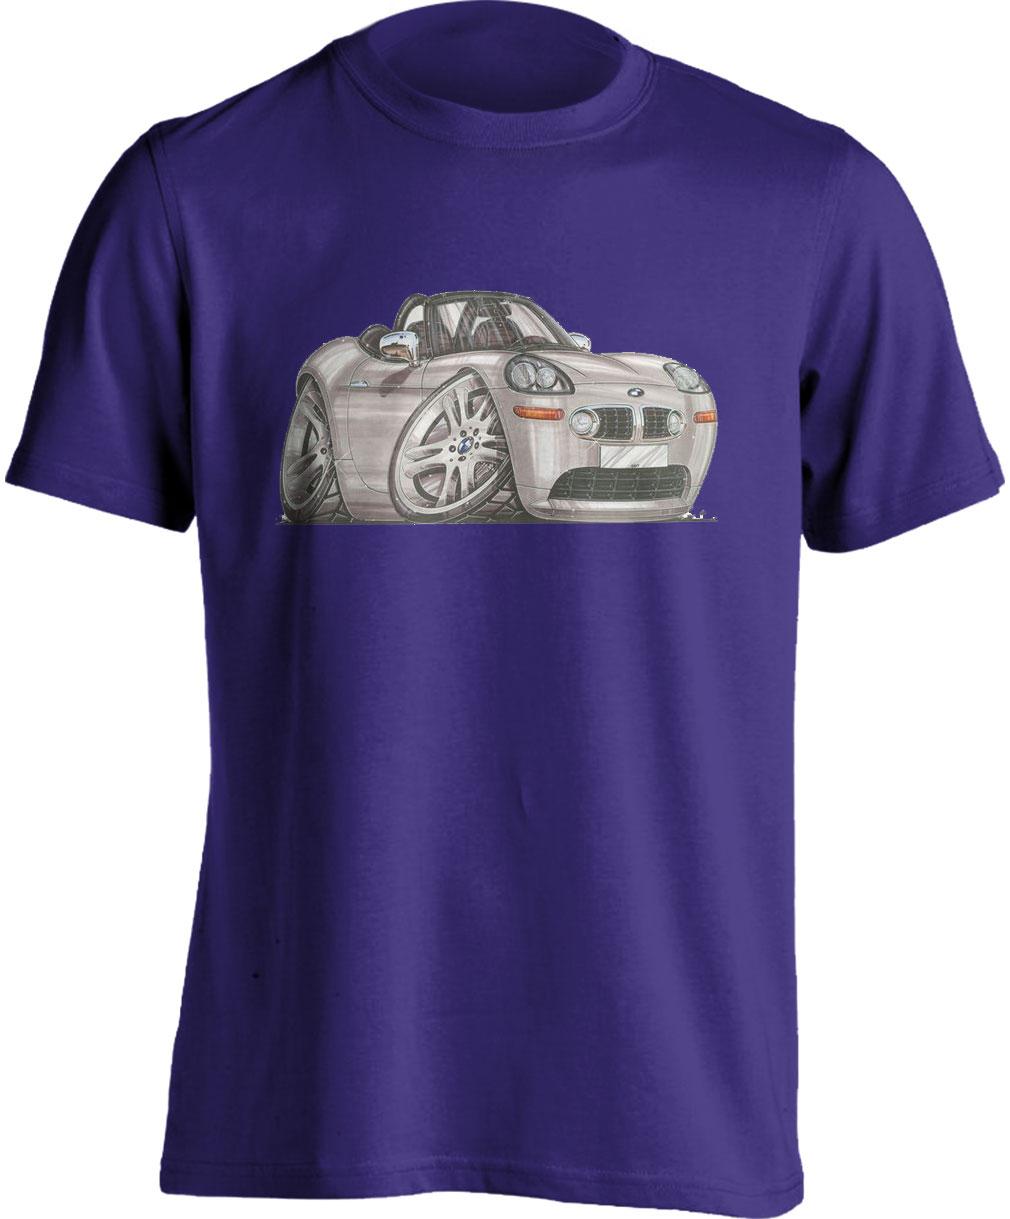 Koolart BMW Z8 Silver-1072-Child's Motor Vehicle Kartoon T Shirt